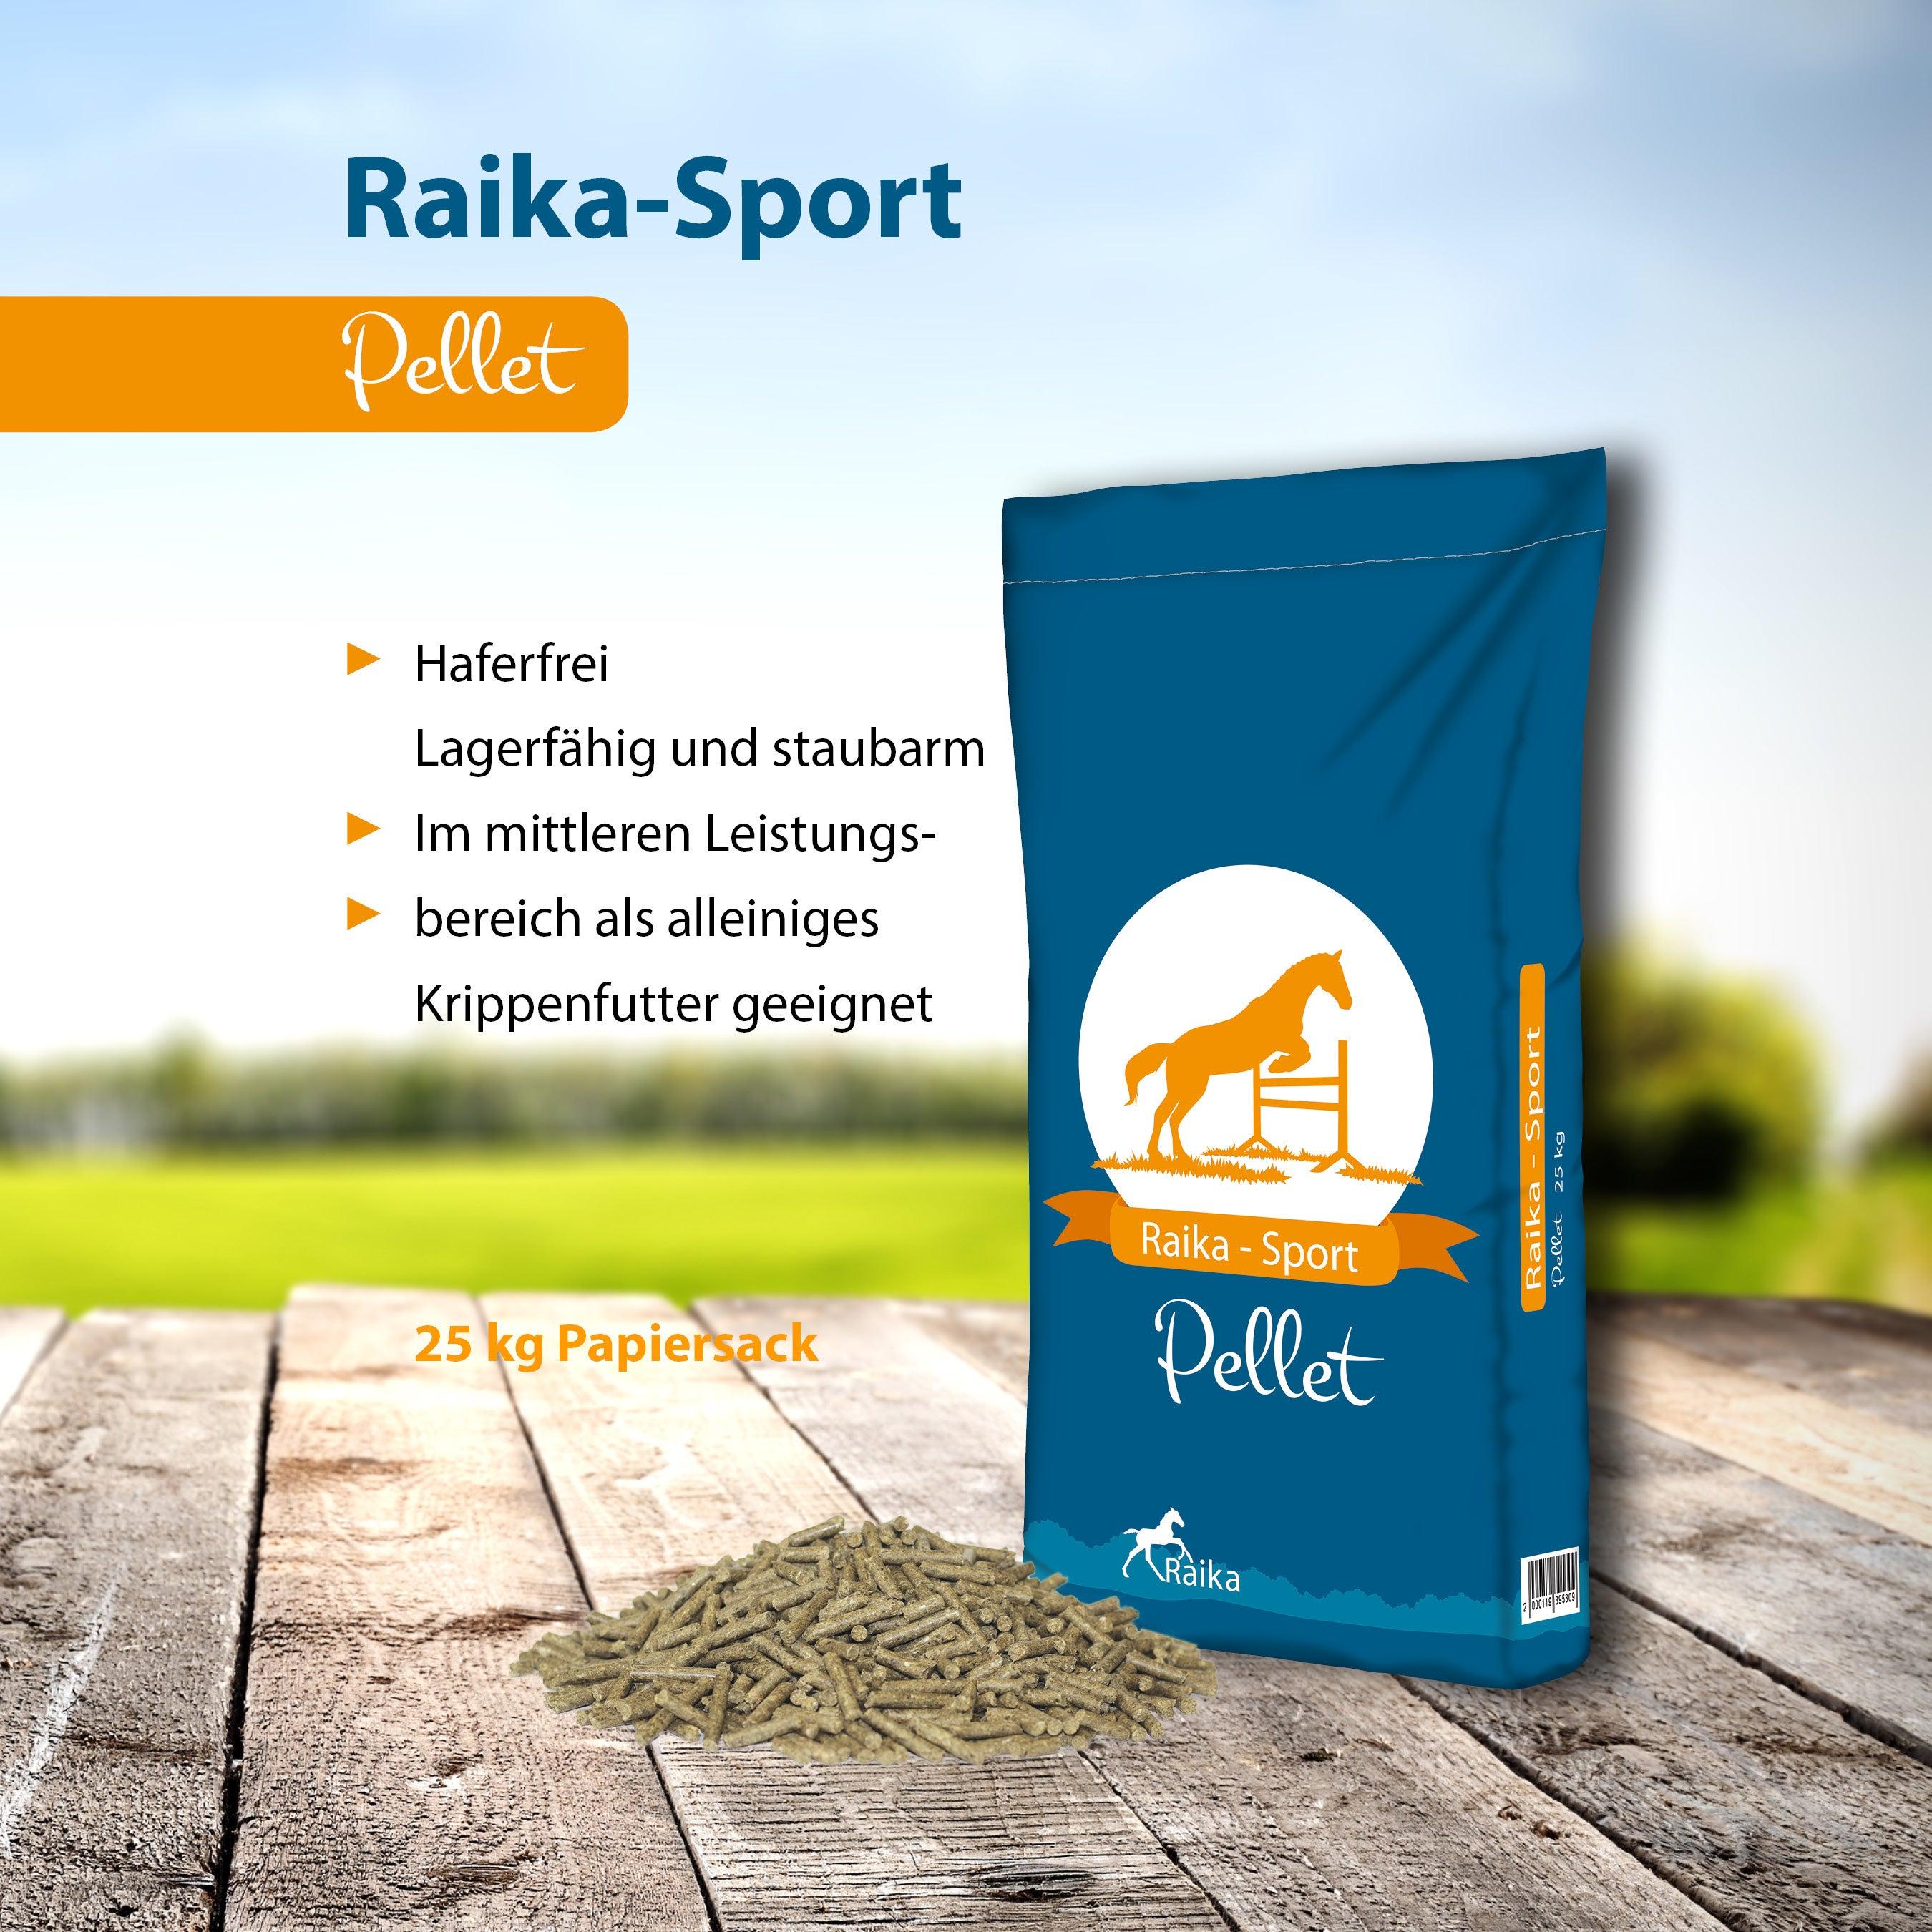 Raika-Sport Pellet Pferdefutter